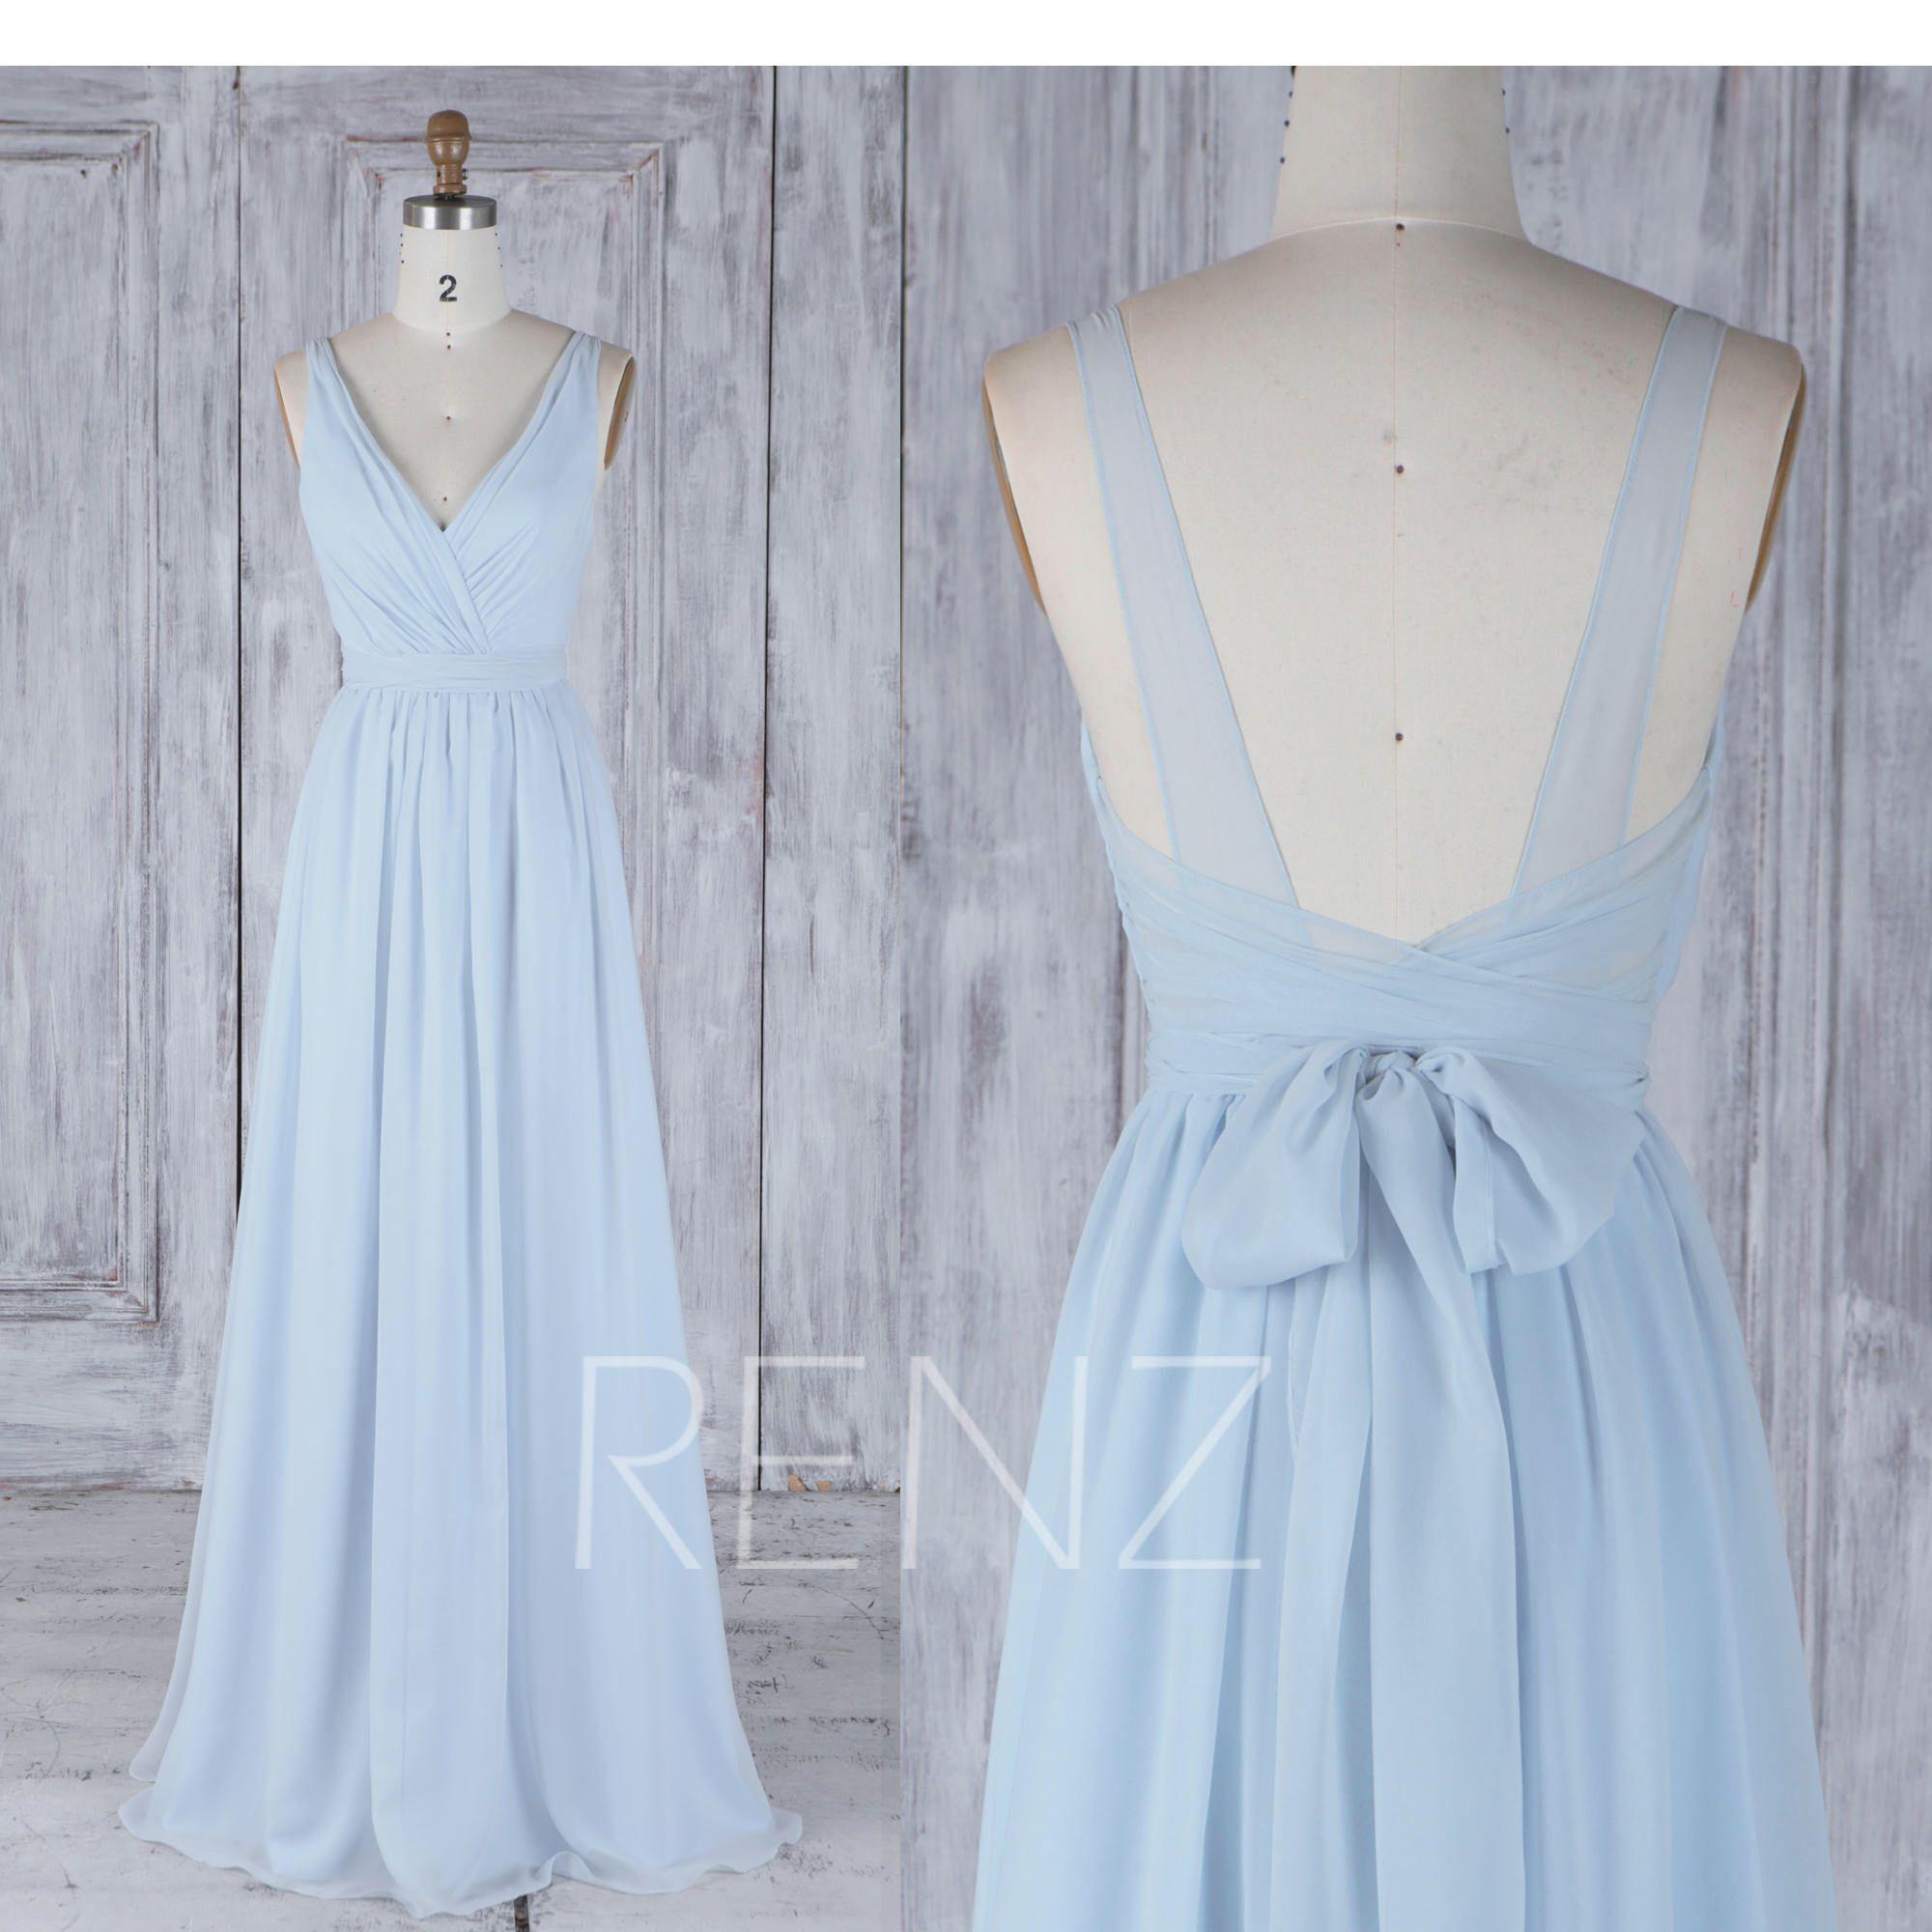 Bridesmaid dress light blue chiffon dresswedding dress with sash